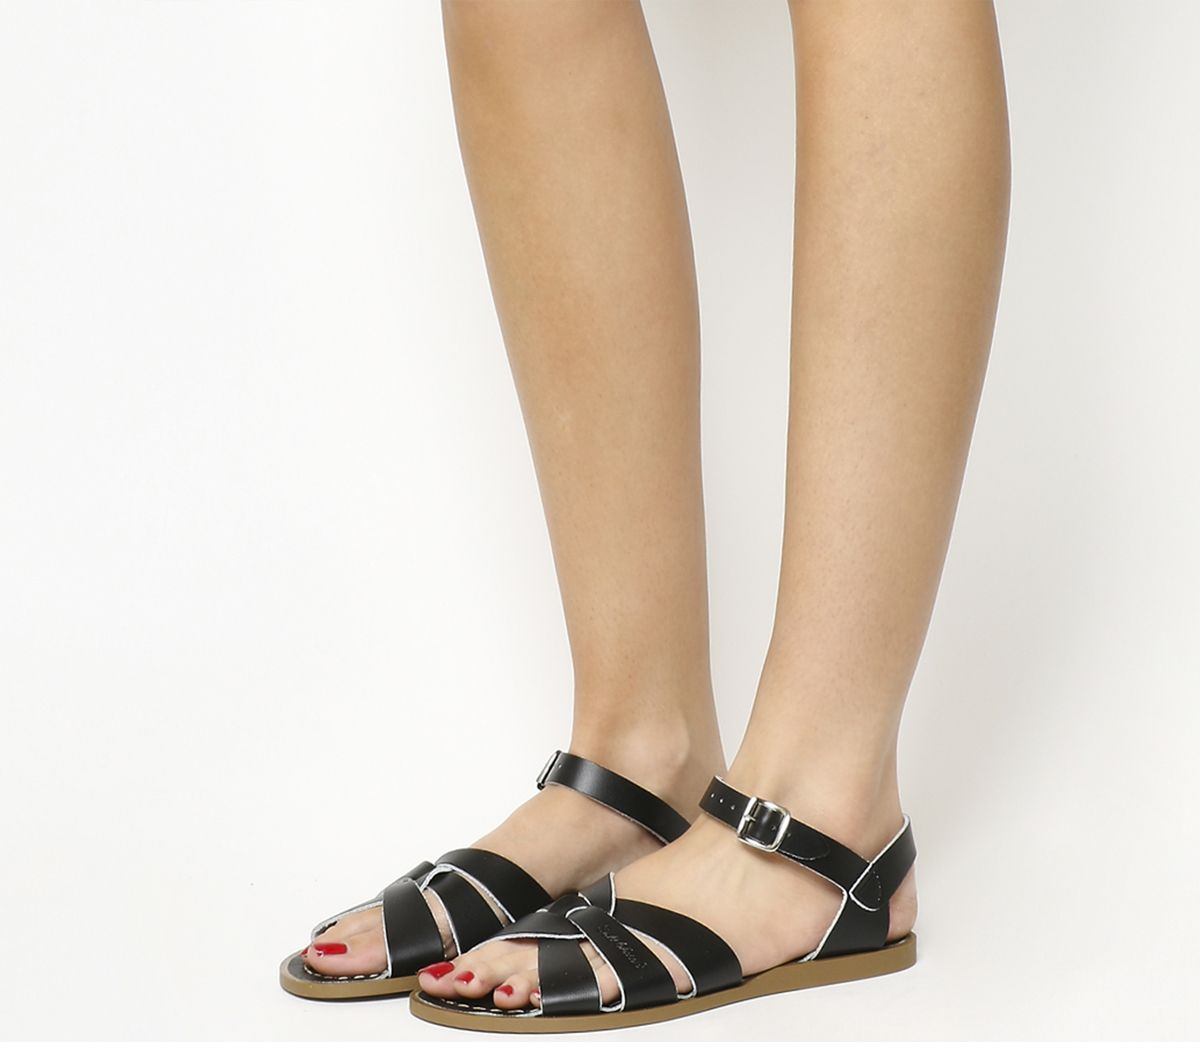 1991f0951c96 Salt Water Original Sandals Black Leather - Sandals